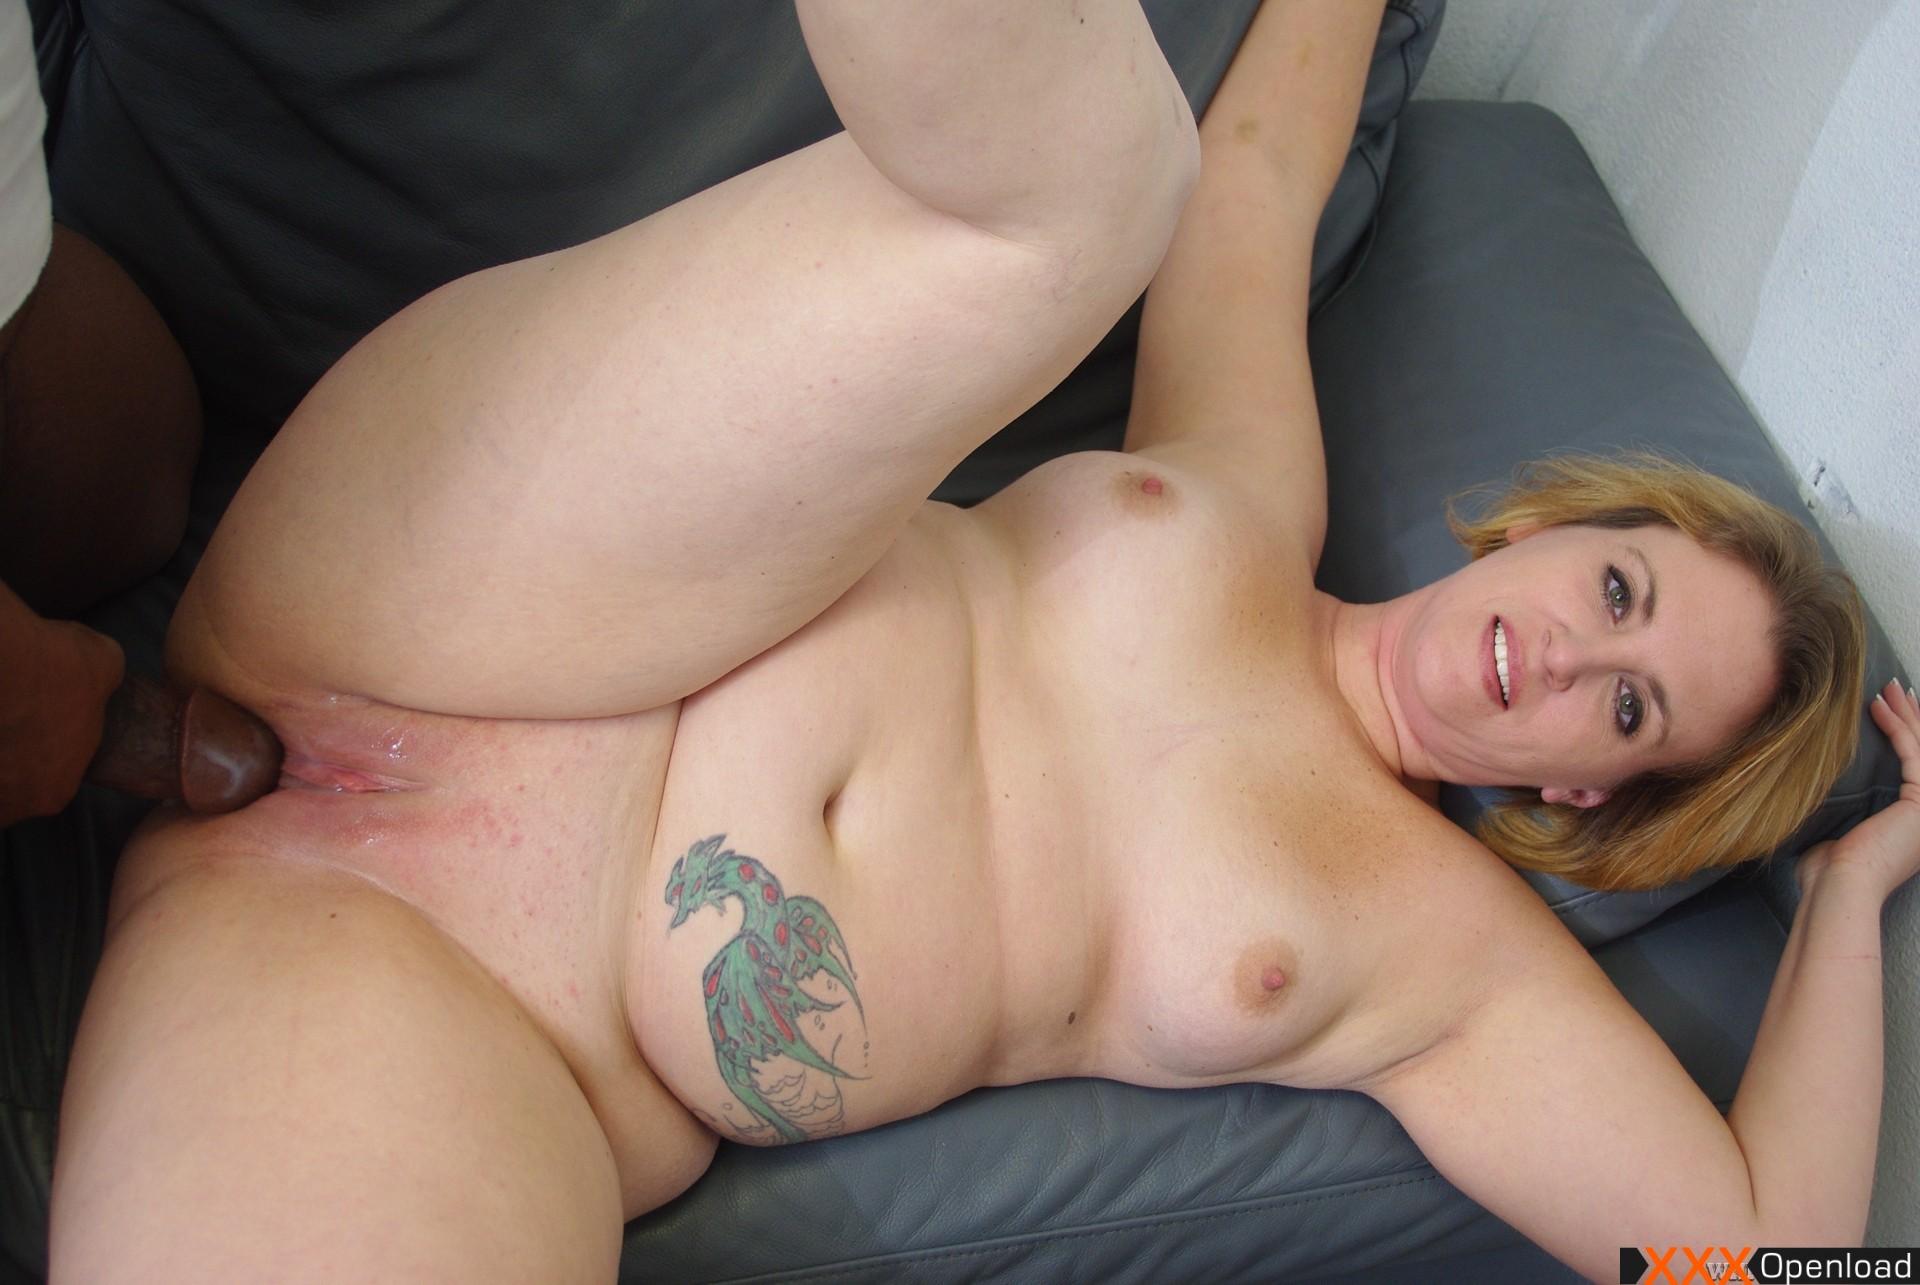 Hot girl flashes vagina